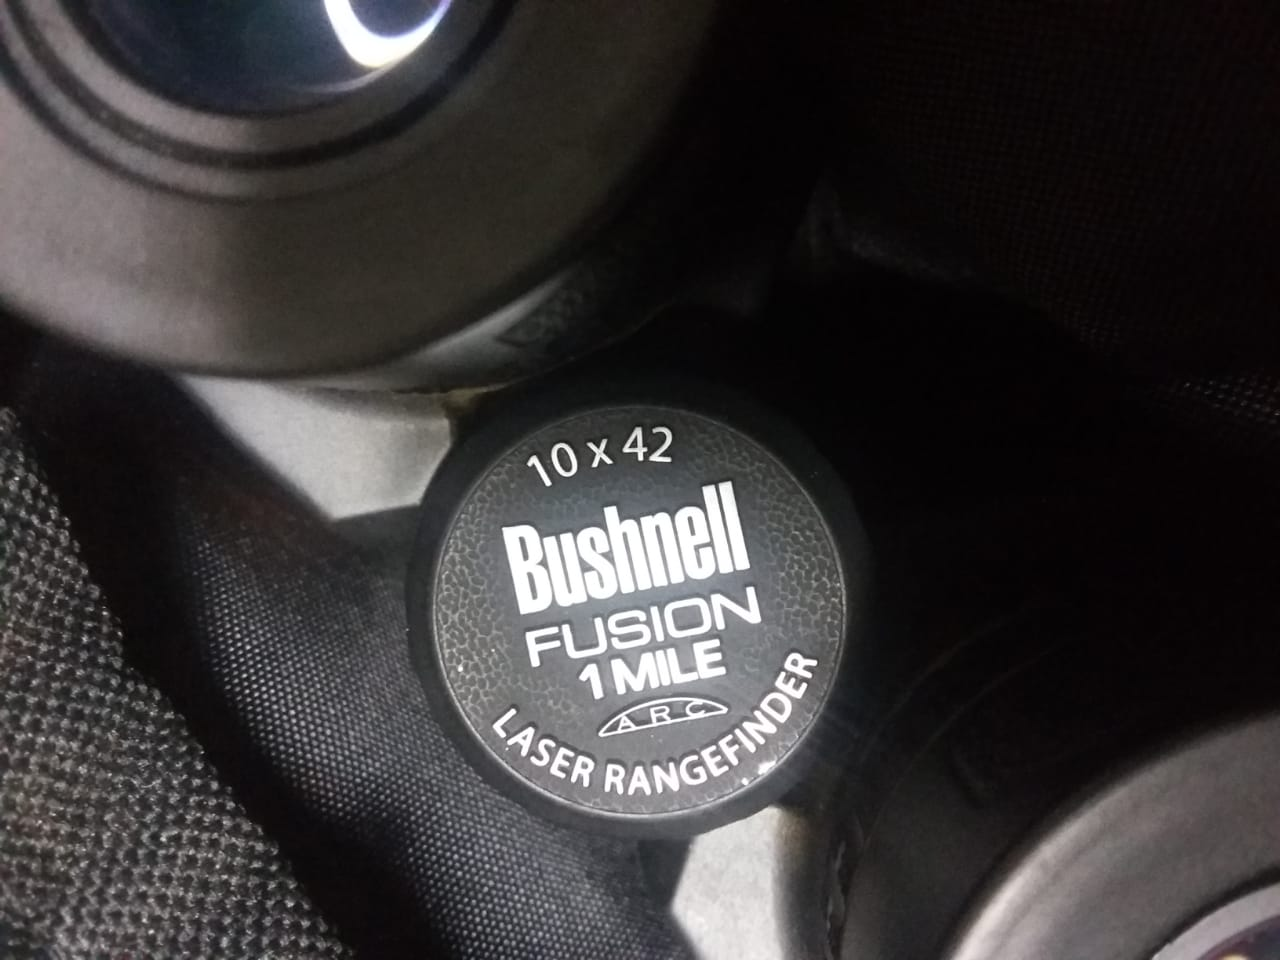 Bushnell Fusion 1 Mile